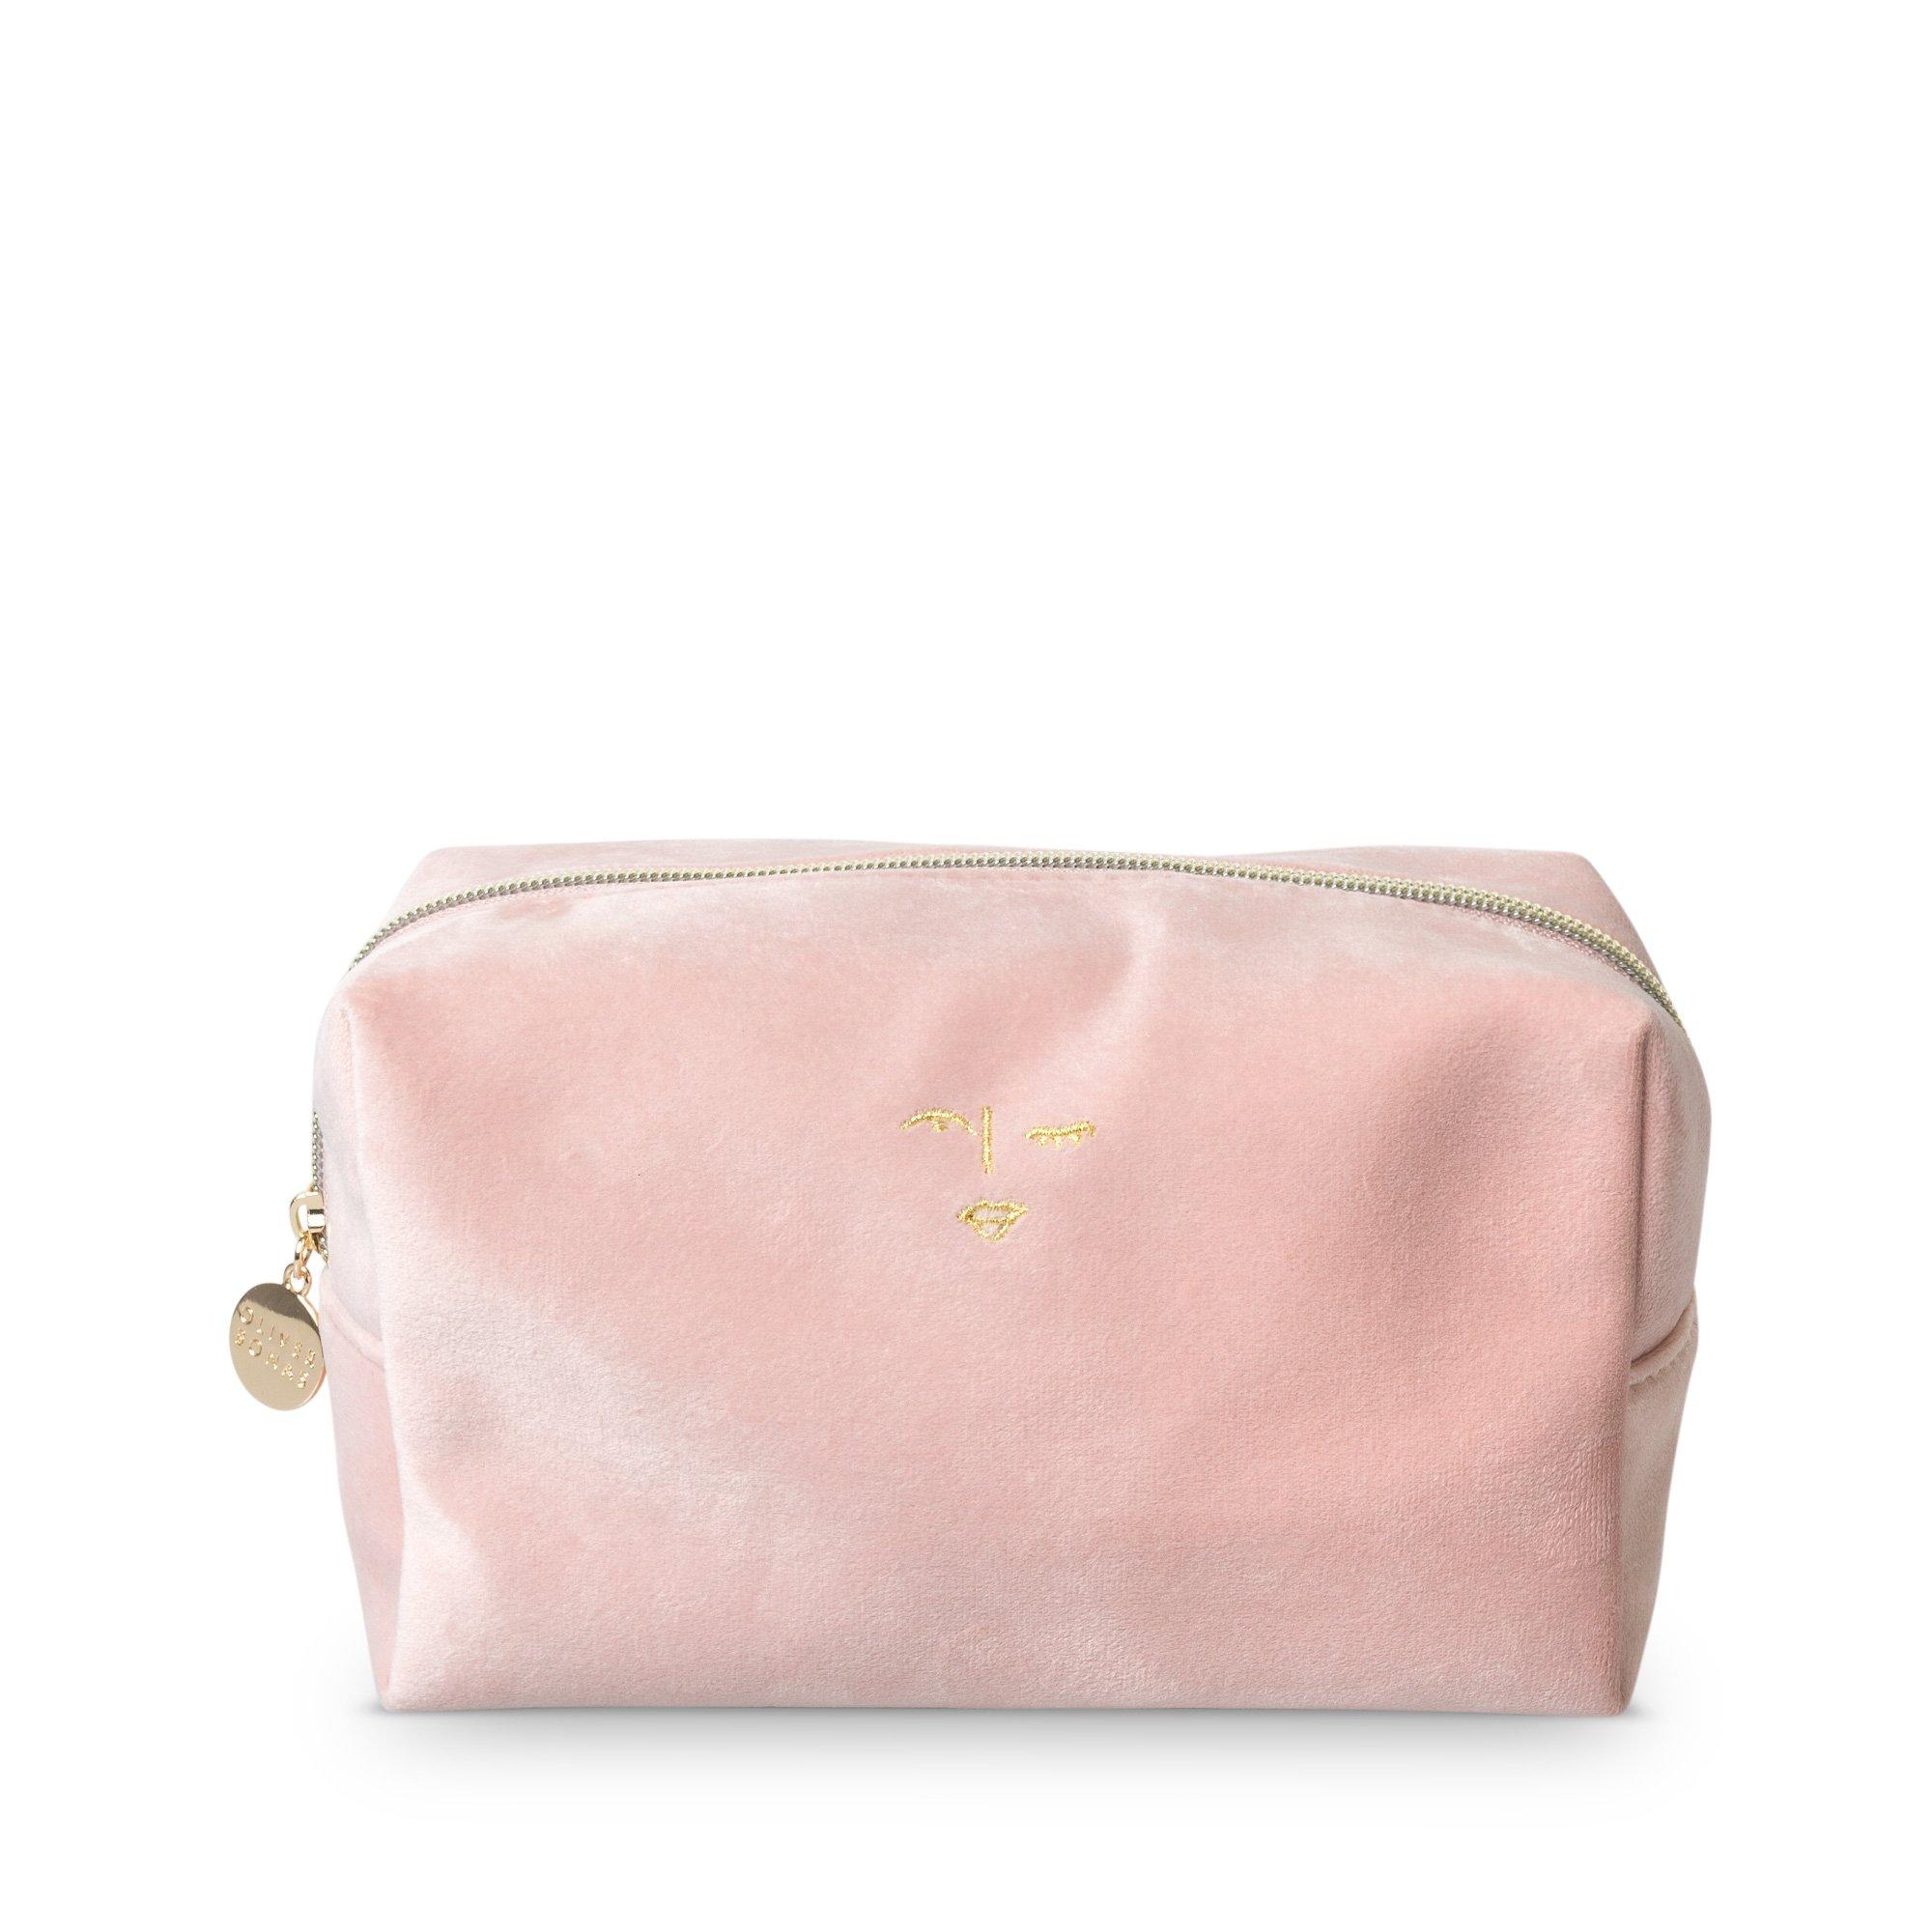 54573ddcf265 1133042 Oliver Bonas Accessories Velvet Cosmetic Bag Jpg